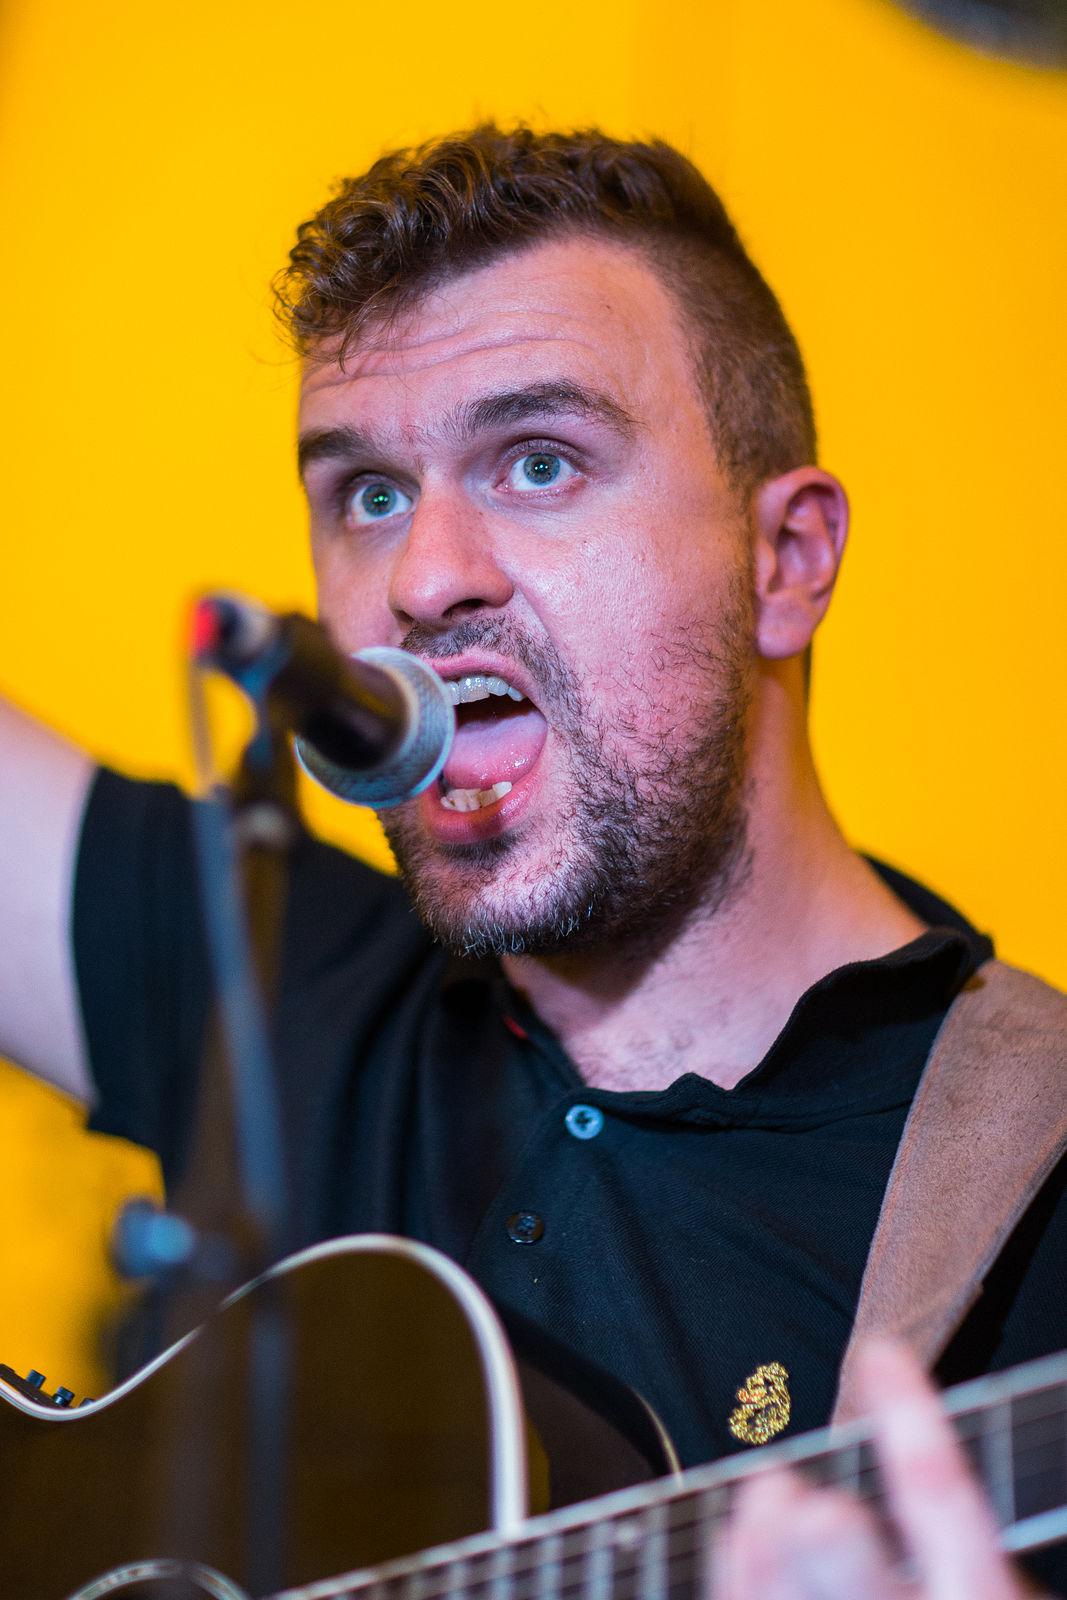 Jon Mcclure